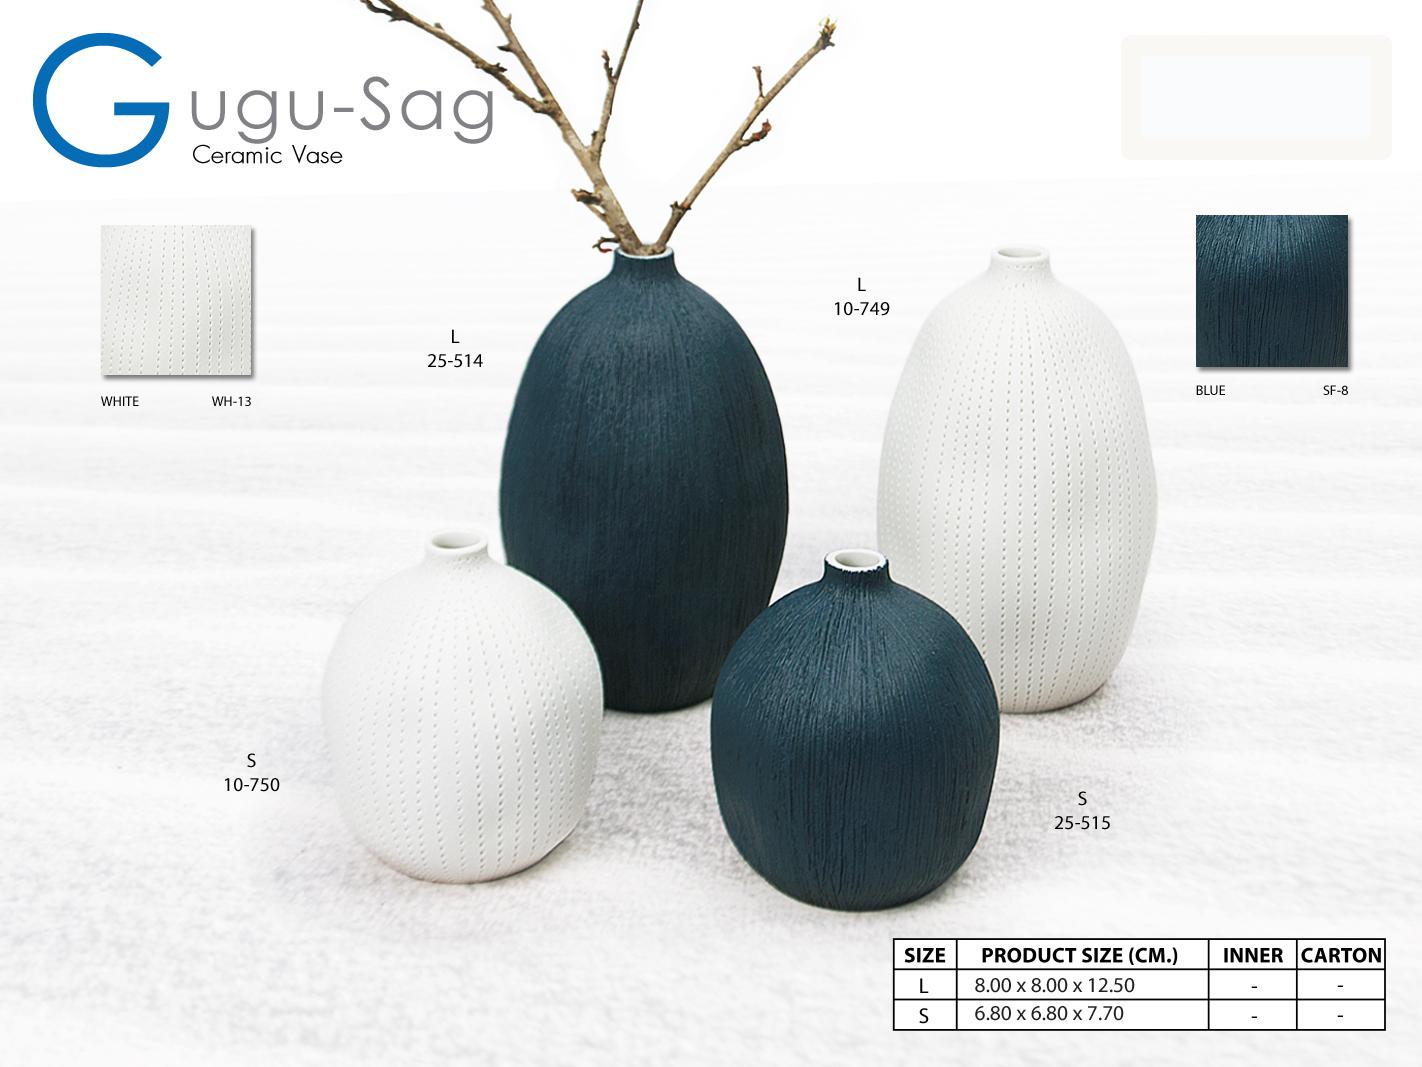 PSCV-Gugu-Sag-sf8wh-13